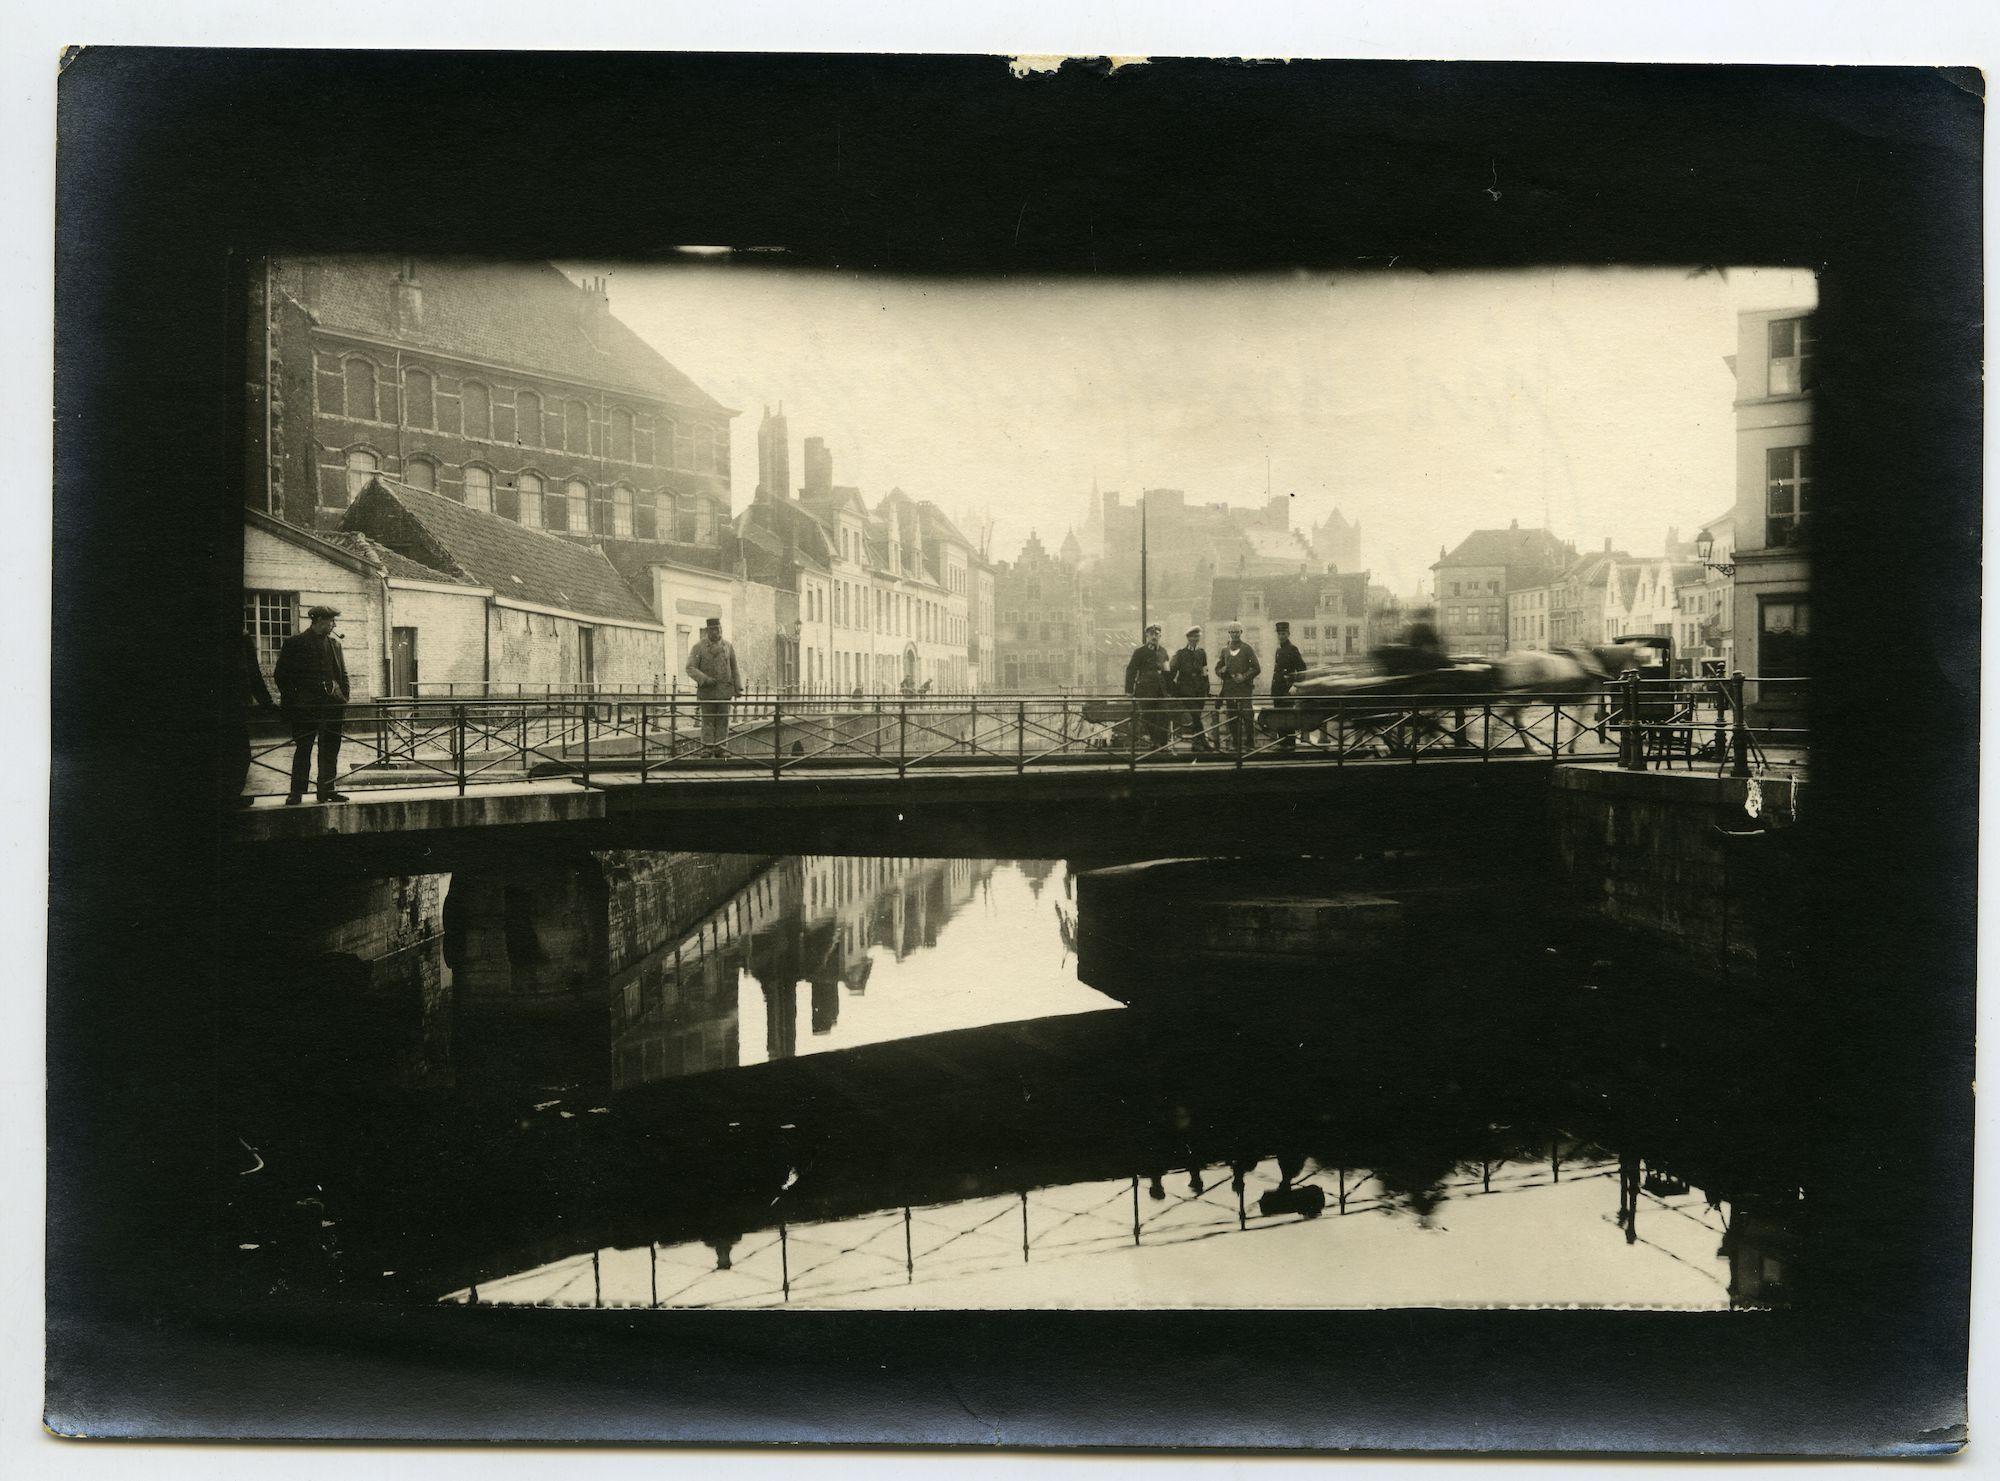 Gent: Lievekaai en Sint-Antoniuskaai: Sint-Antoniusbrug, 1915-1916